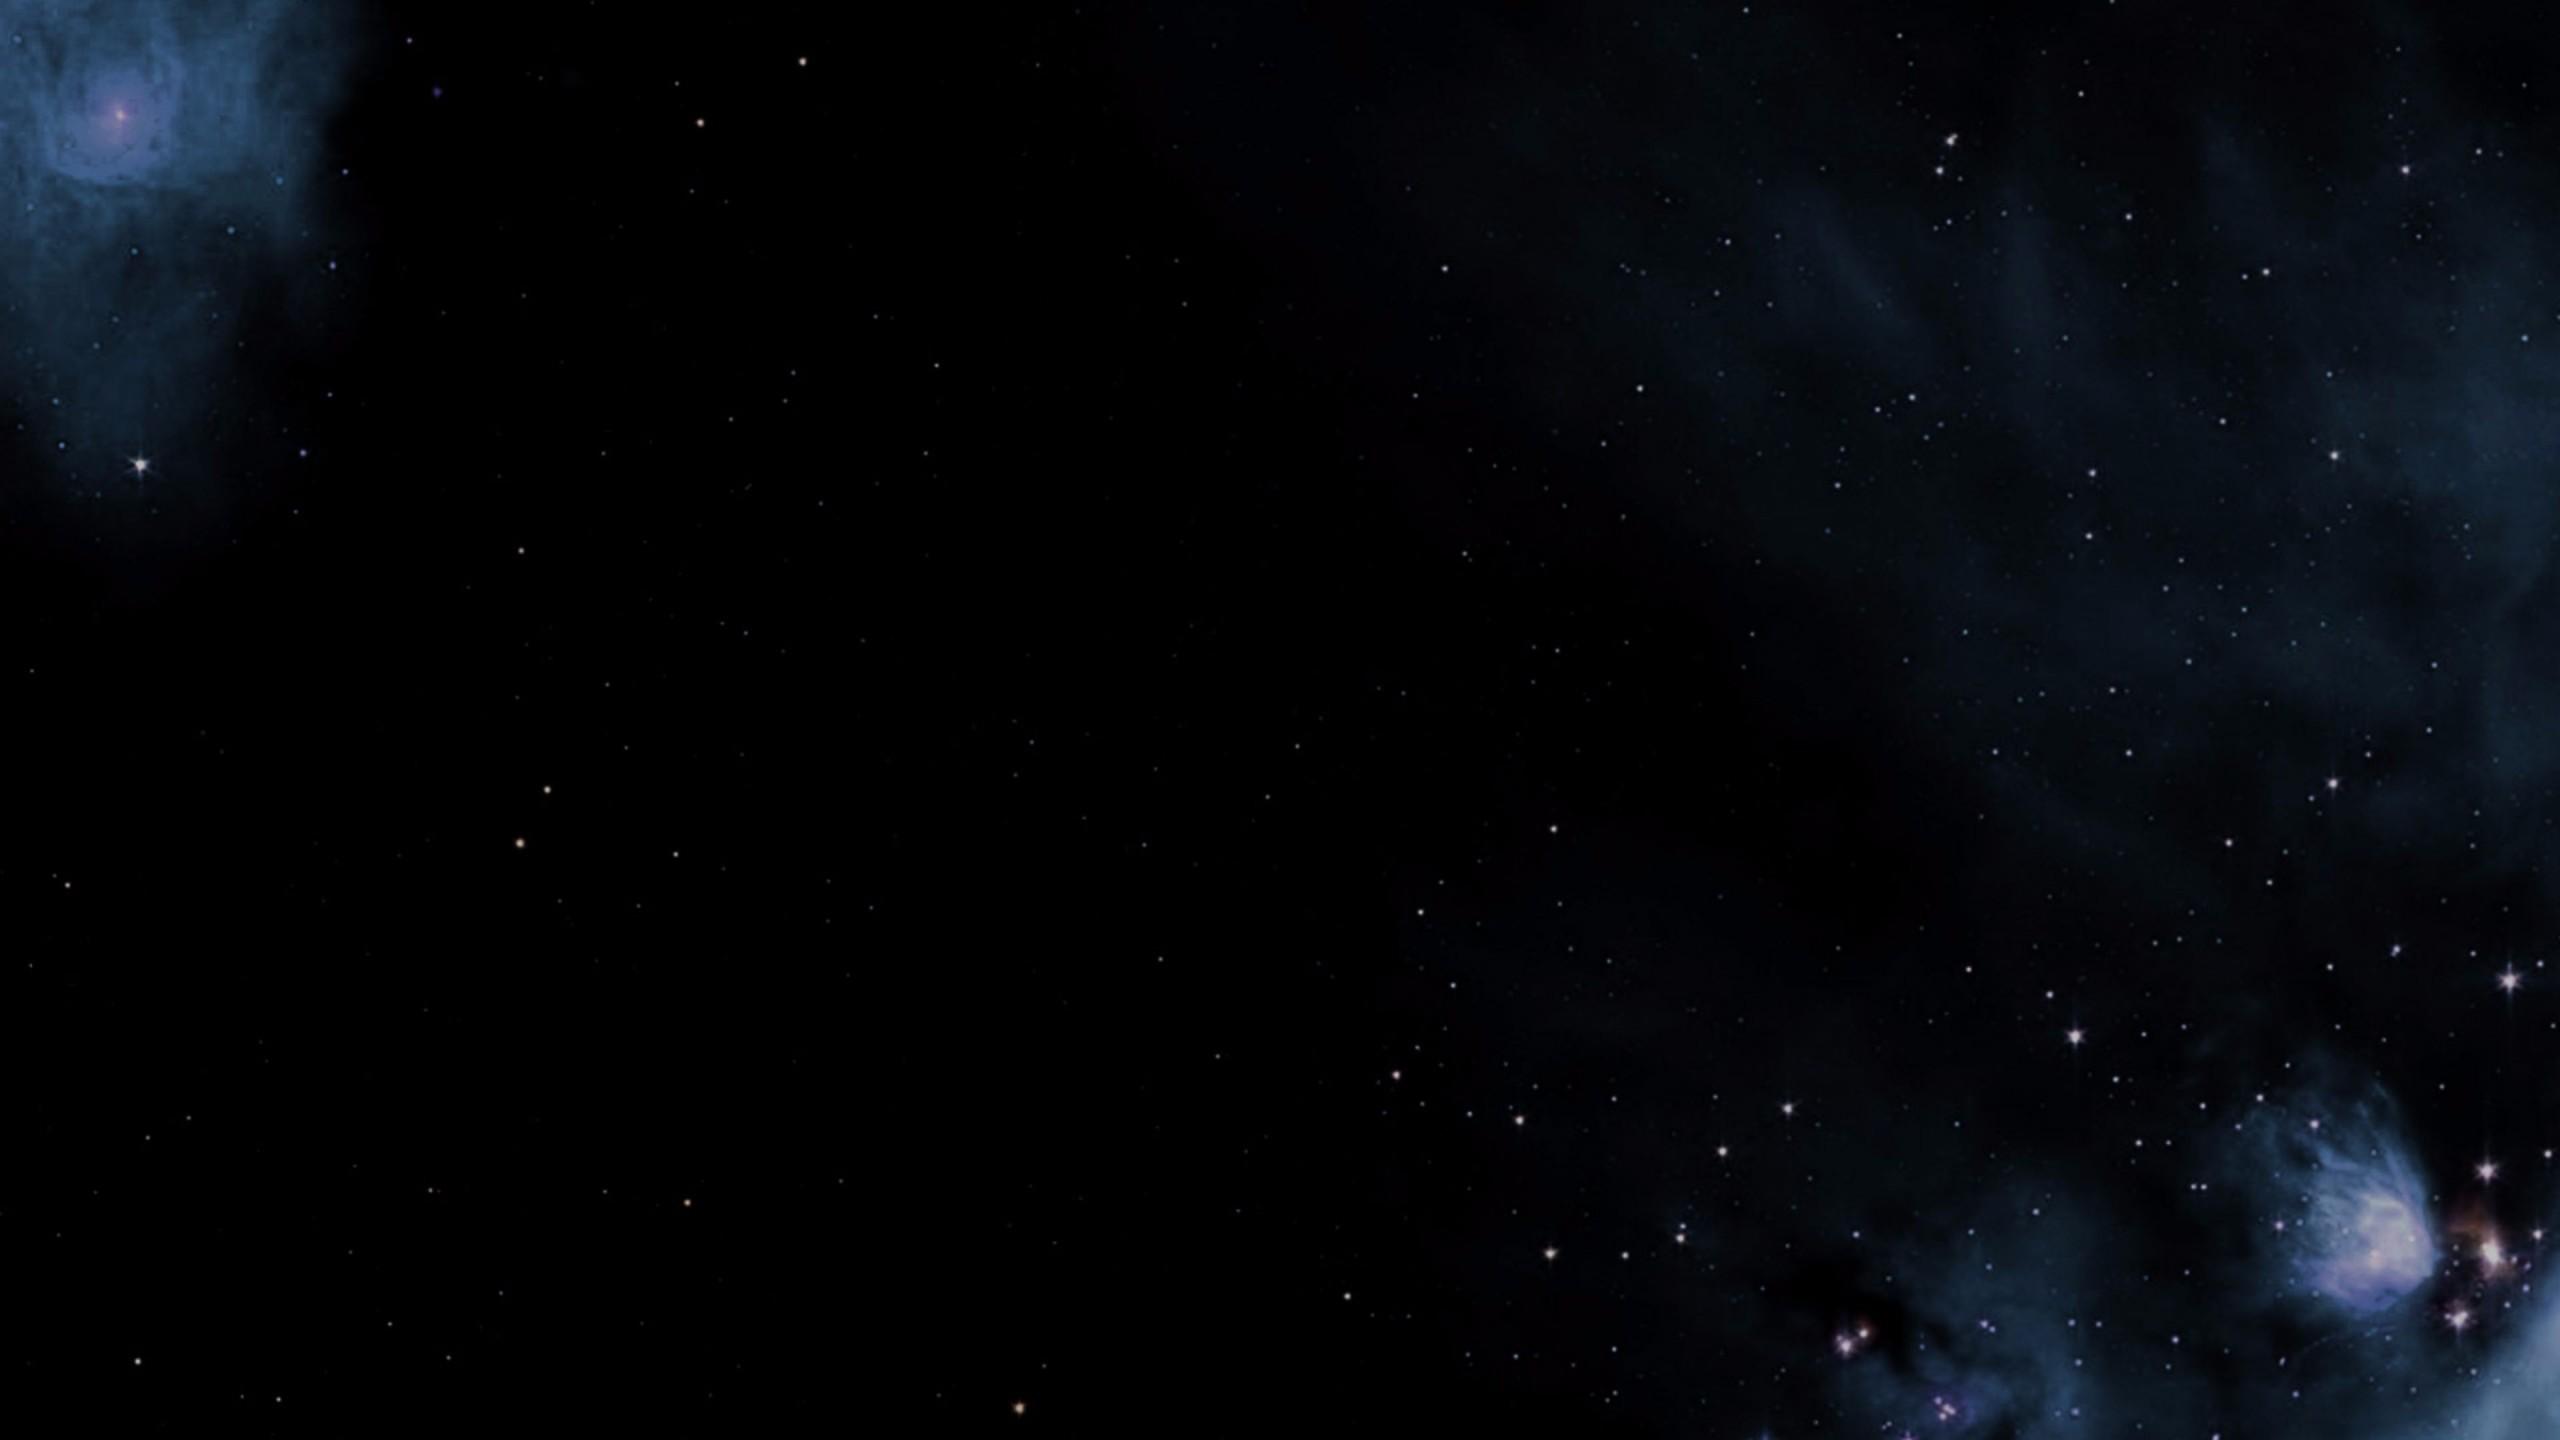 Dark-Deep-Space-4K-Wallpaper-2560×1440